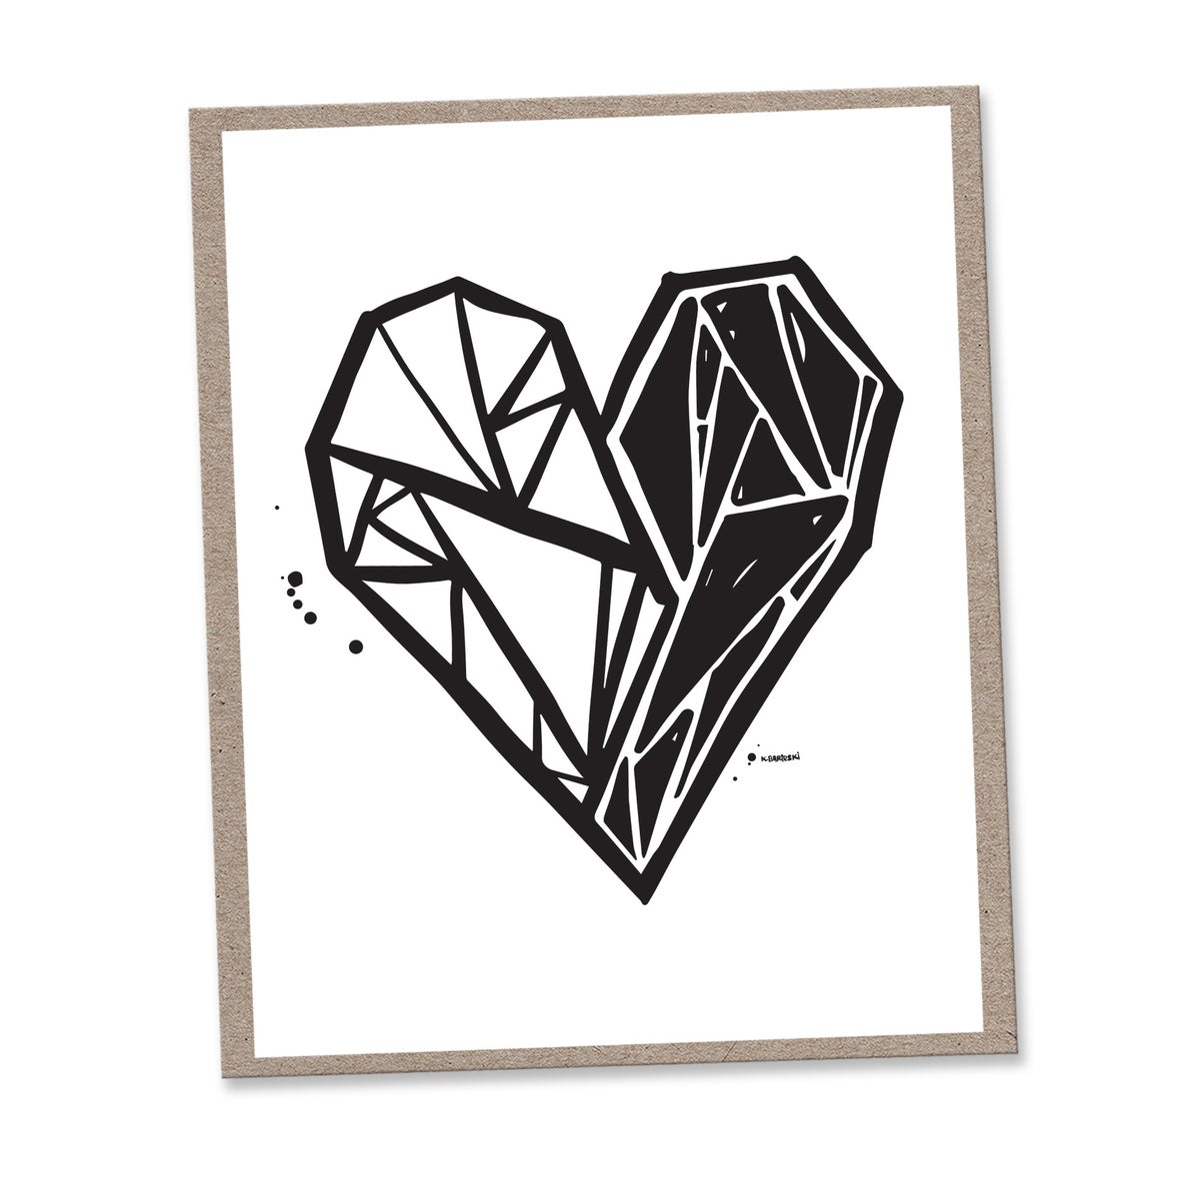 Image of FRACTURED HEART #kbscript print